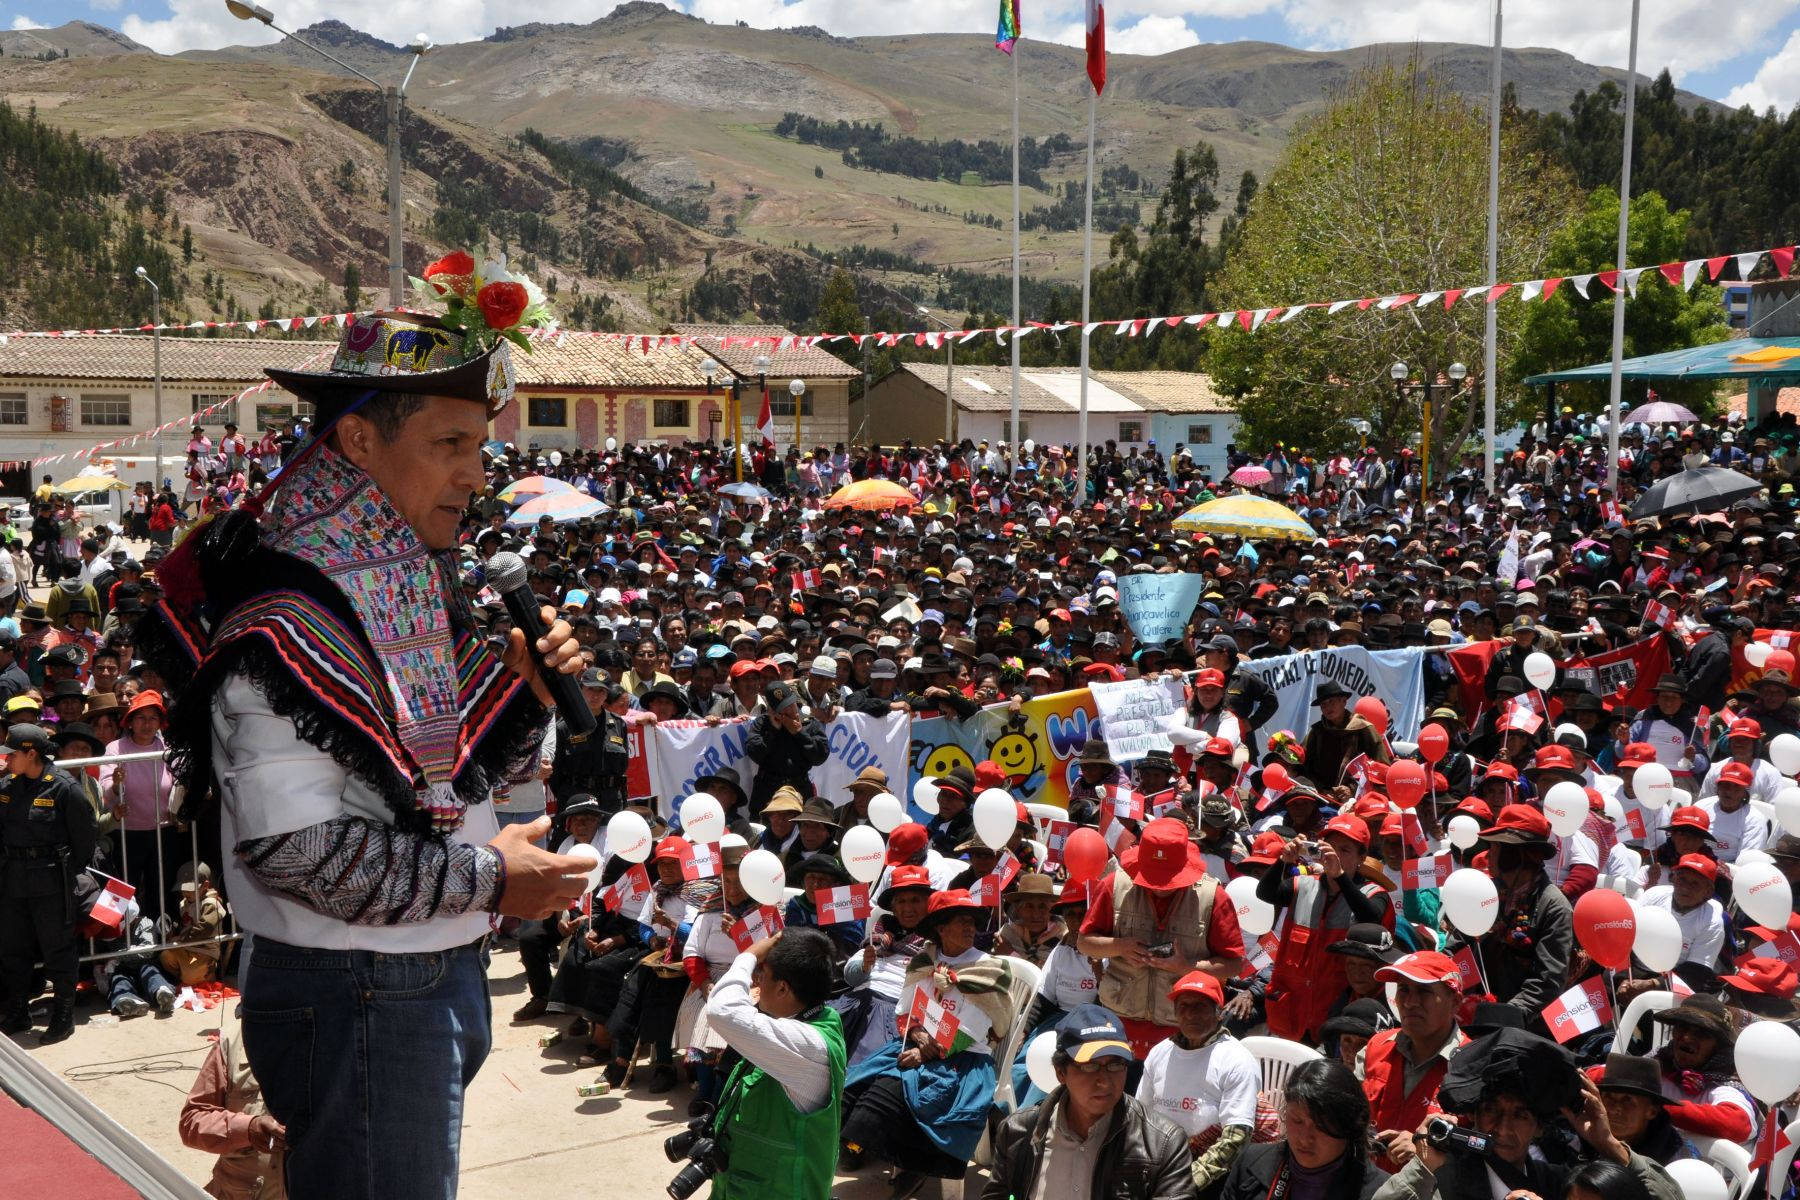 Peruvian President Ollanta Humala launches Pension 65 social program in Yauli, Huancavelica. Photo:ANDINA/Prensa Presidencia